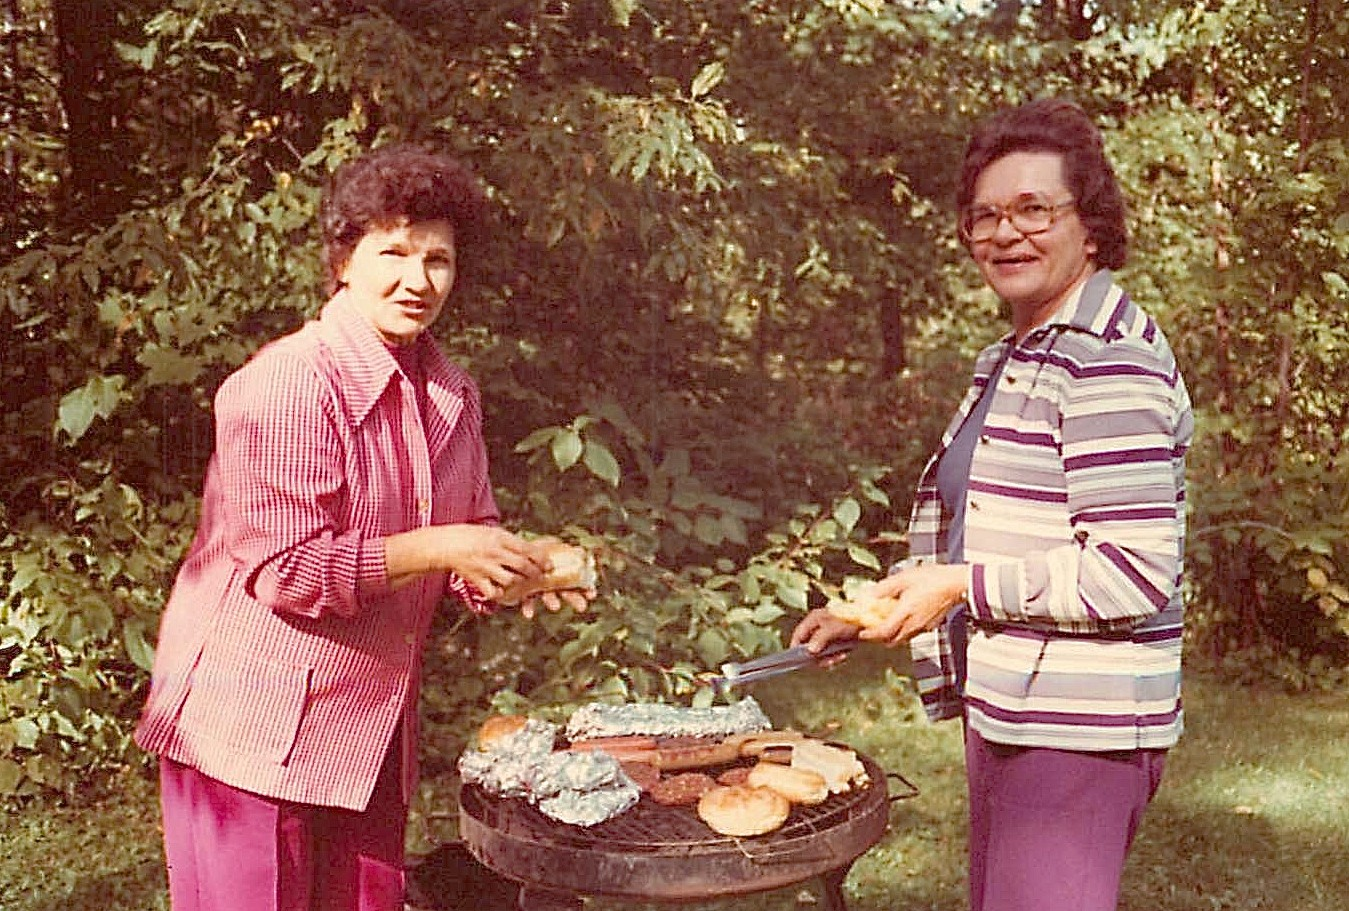 Helen Bednarski & Mayme Bogden Baldyga, Tuscarora Lake picnic 1976